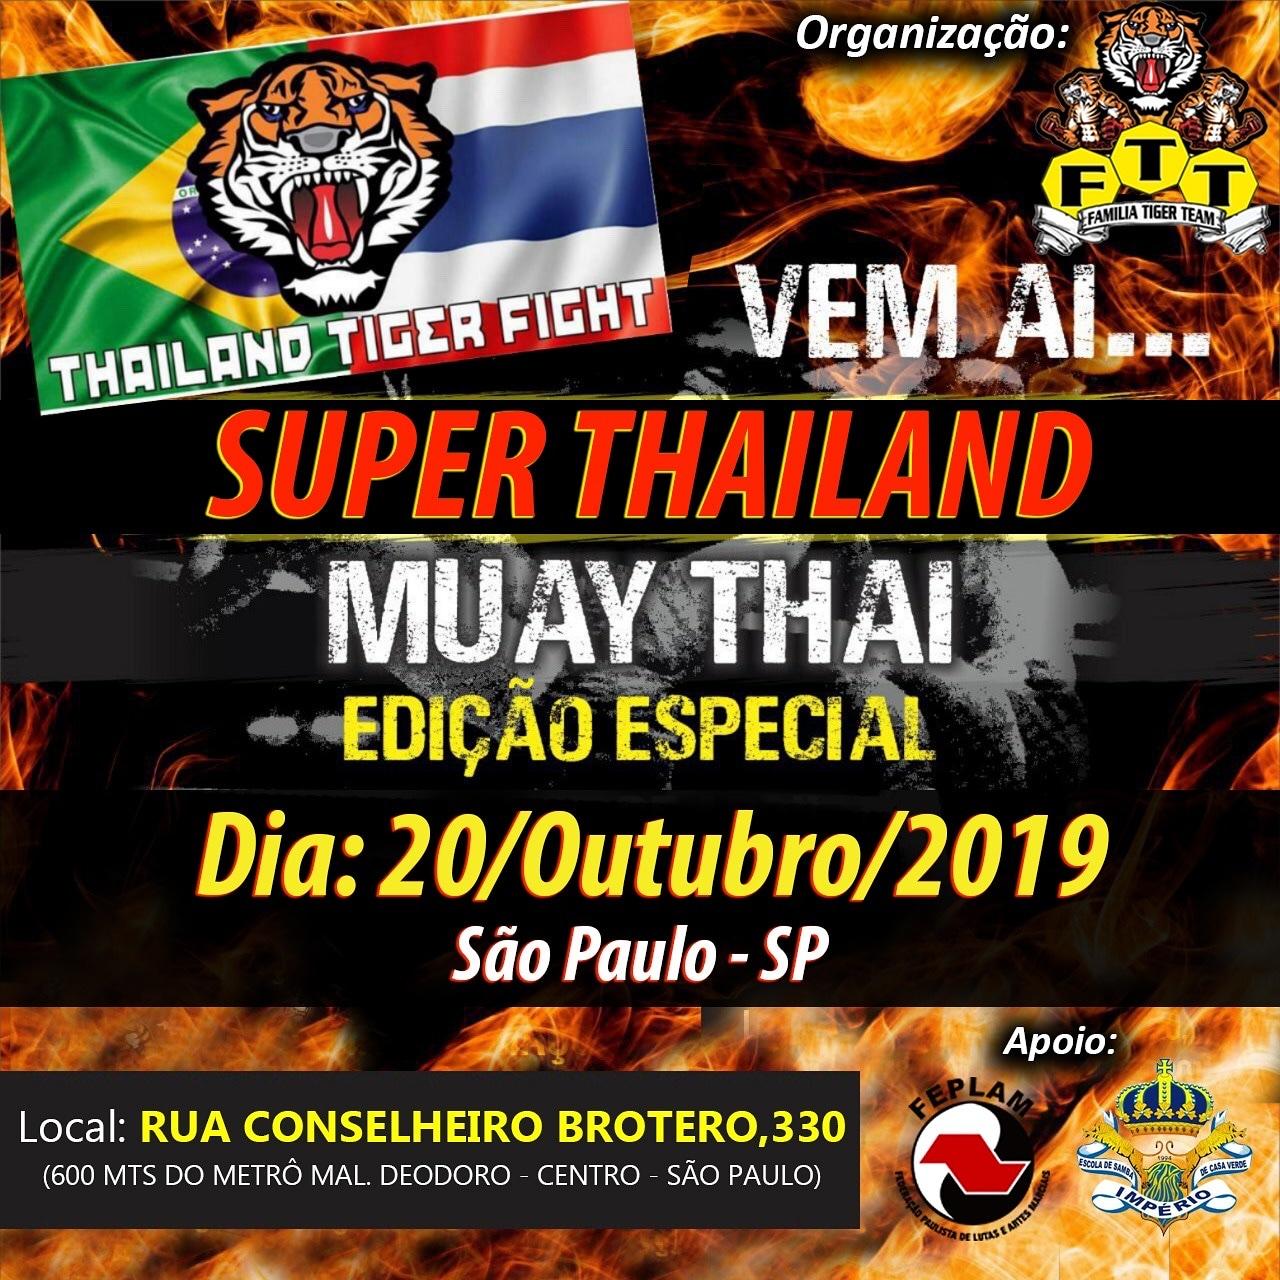 Thailand Tiger Fight